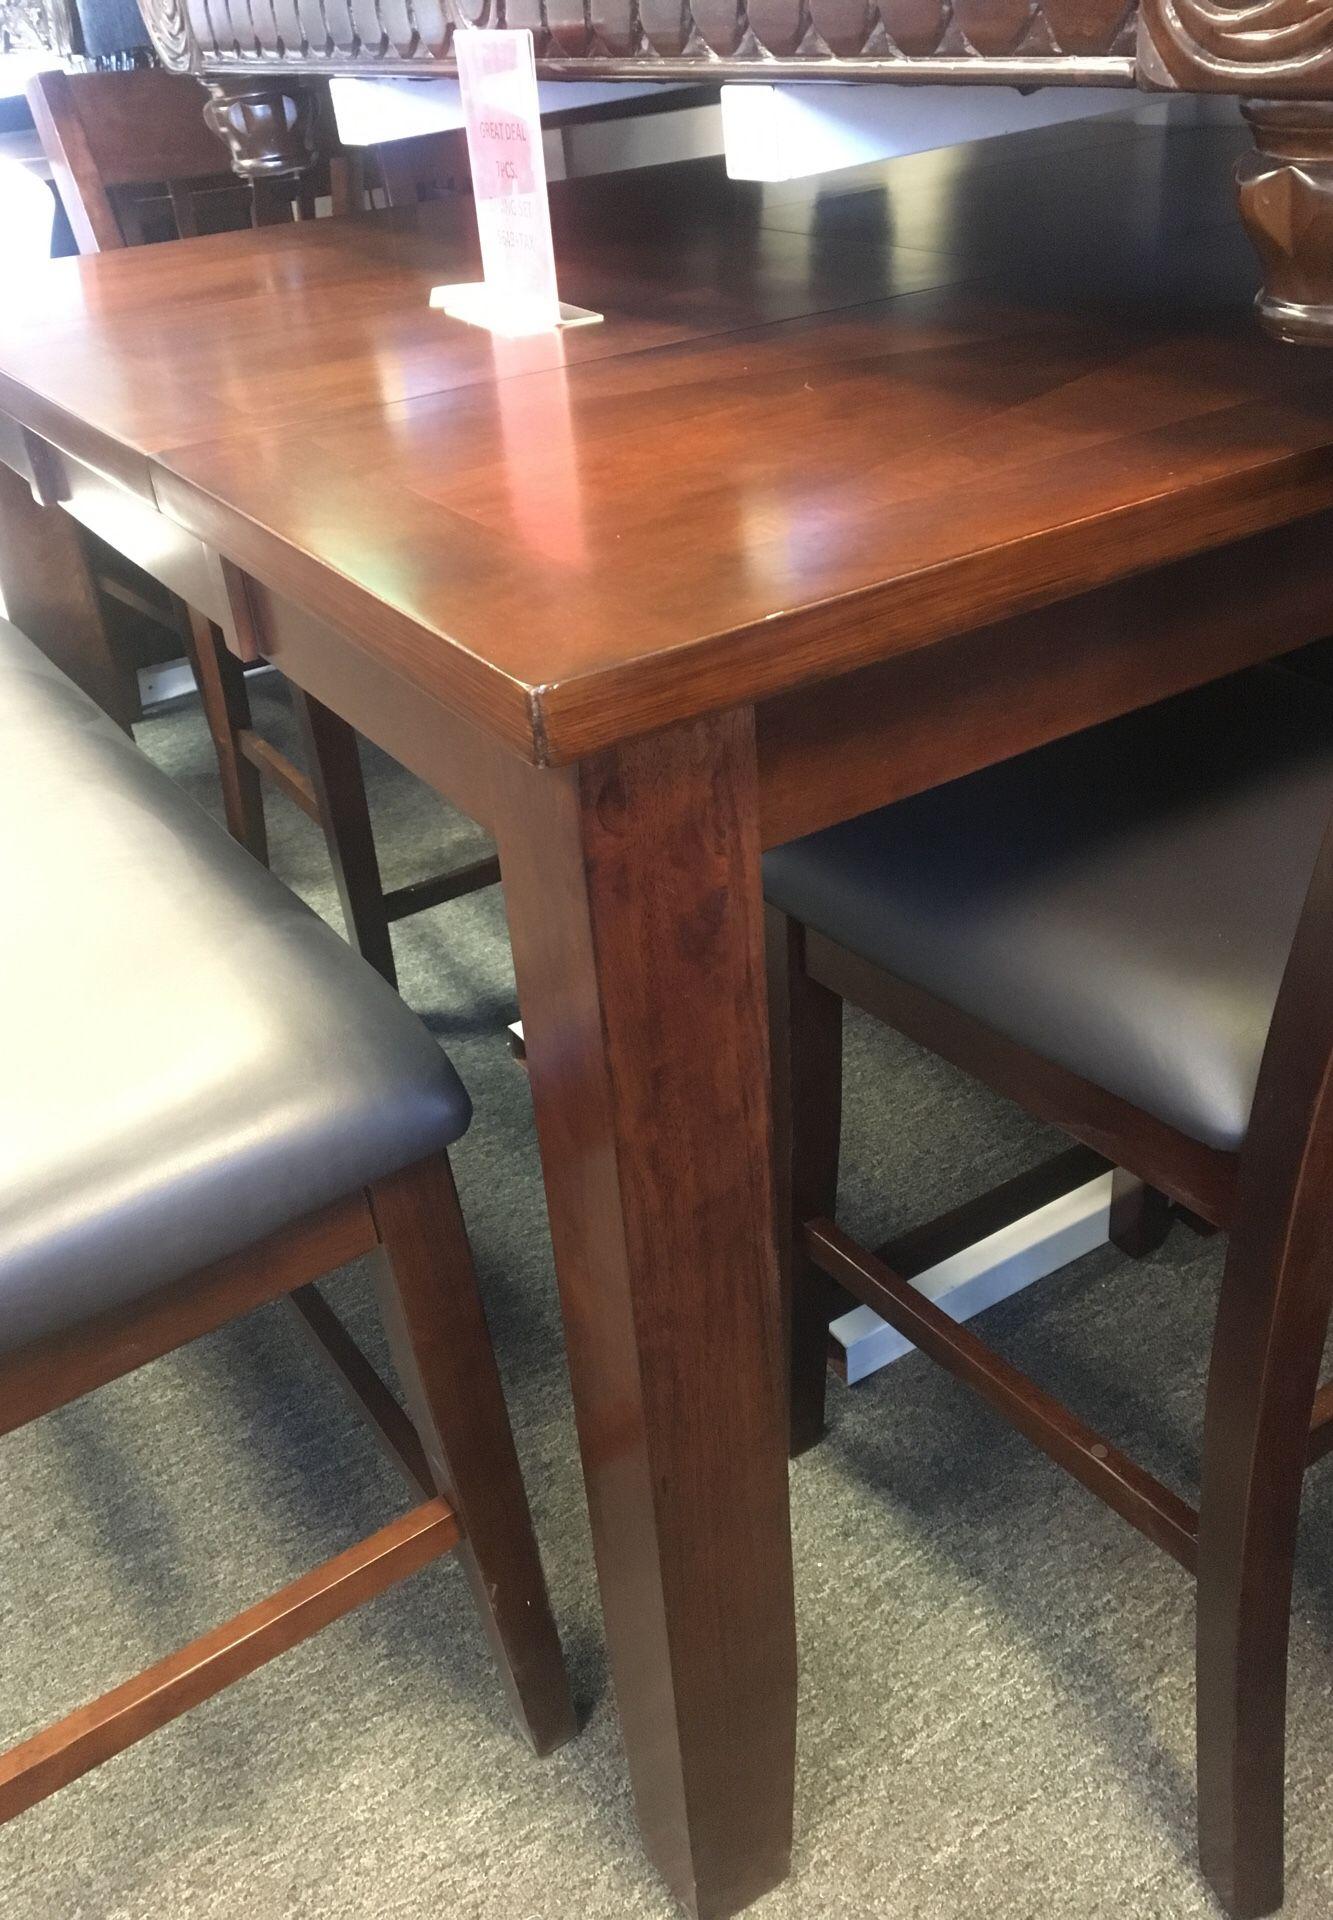 Solid wood dining set used as display